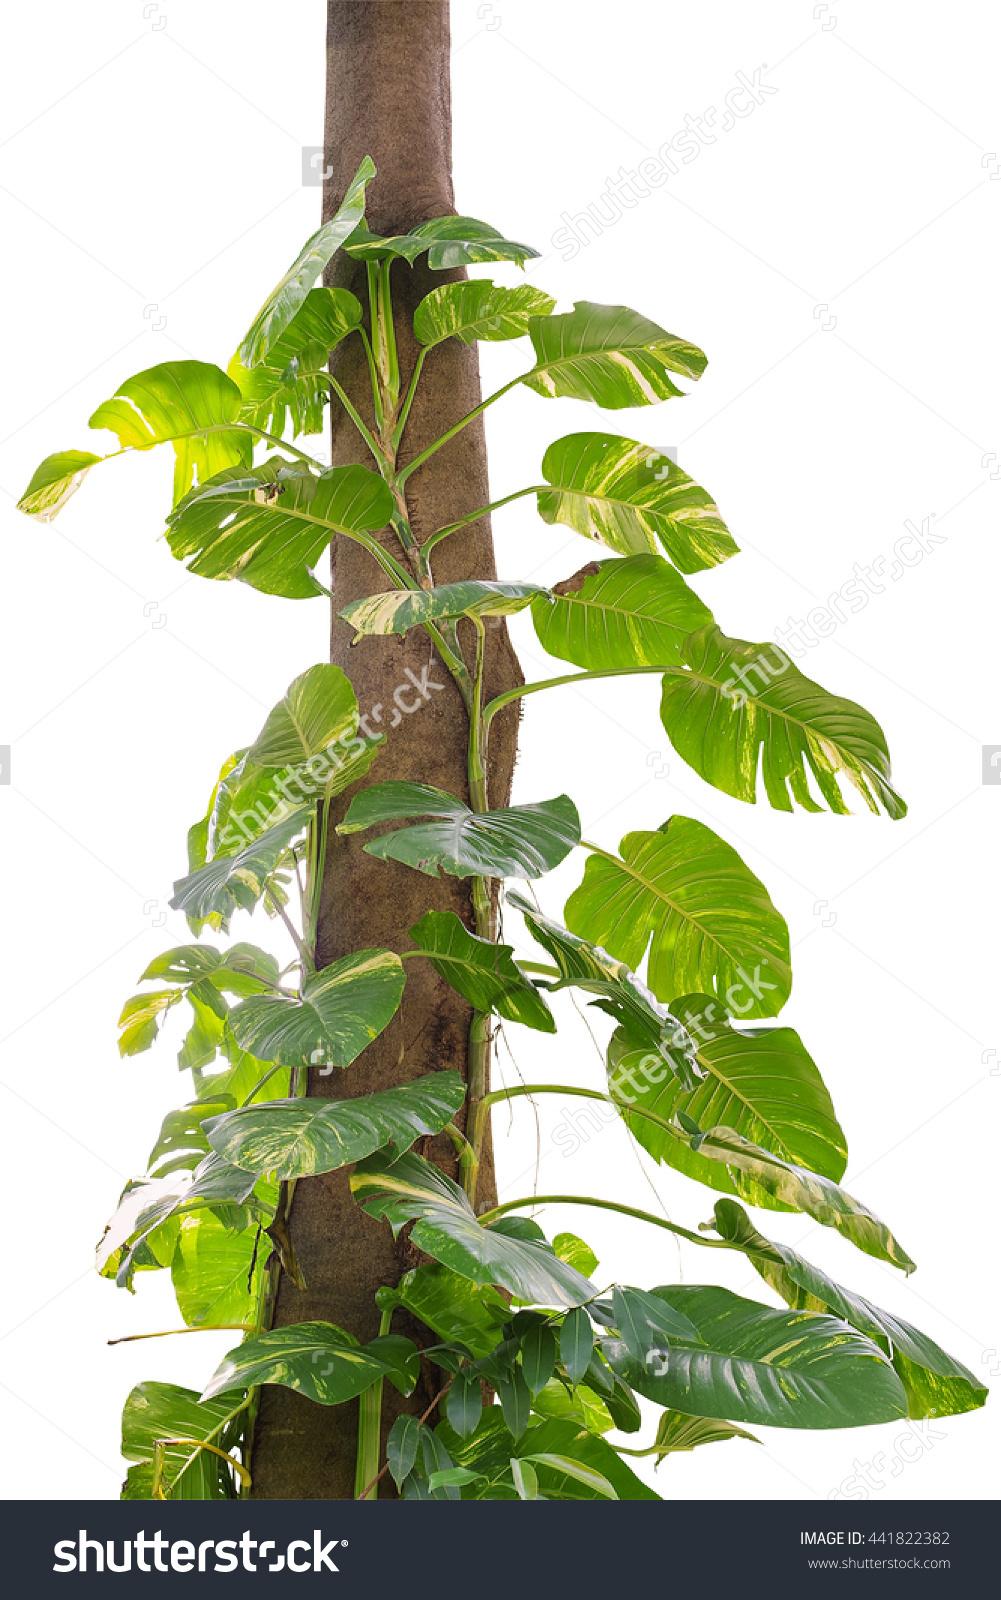 Creeper Plant Growing Wild Jungle Vines Stock Photo 441822382.